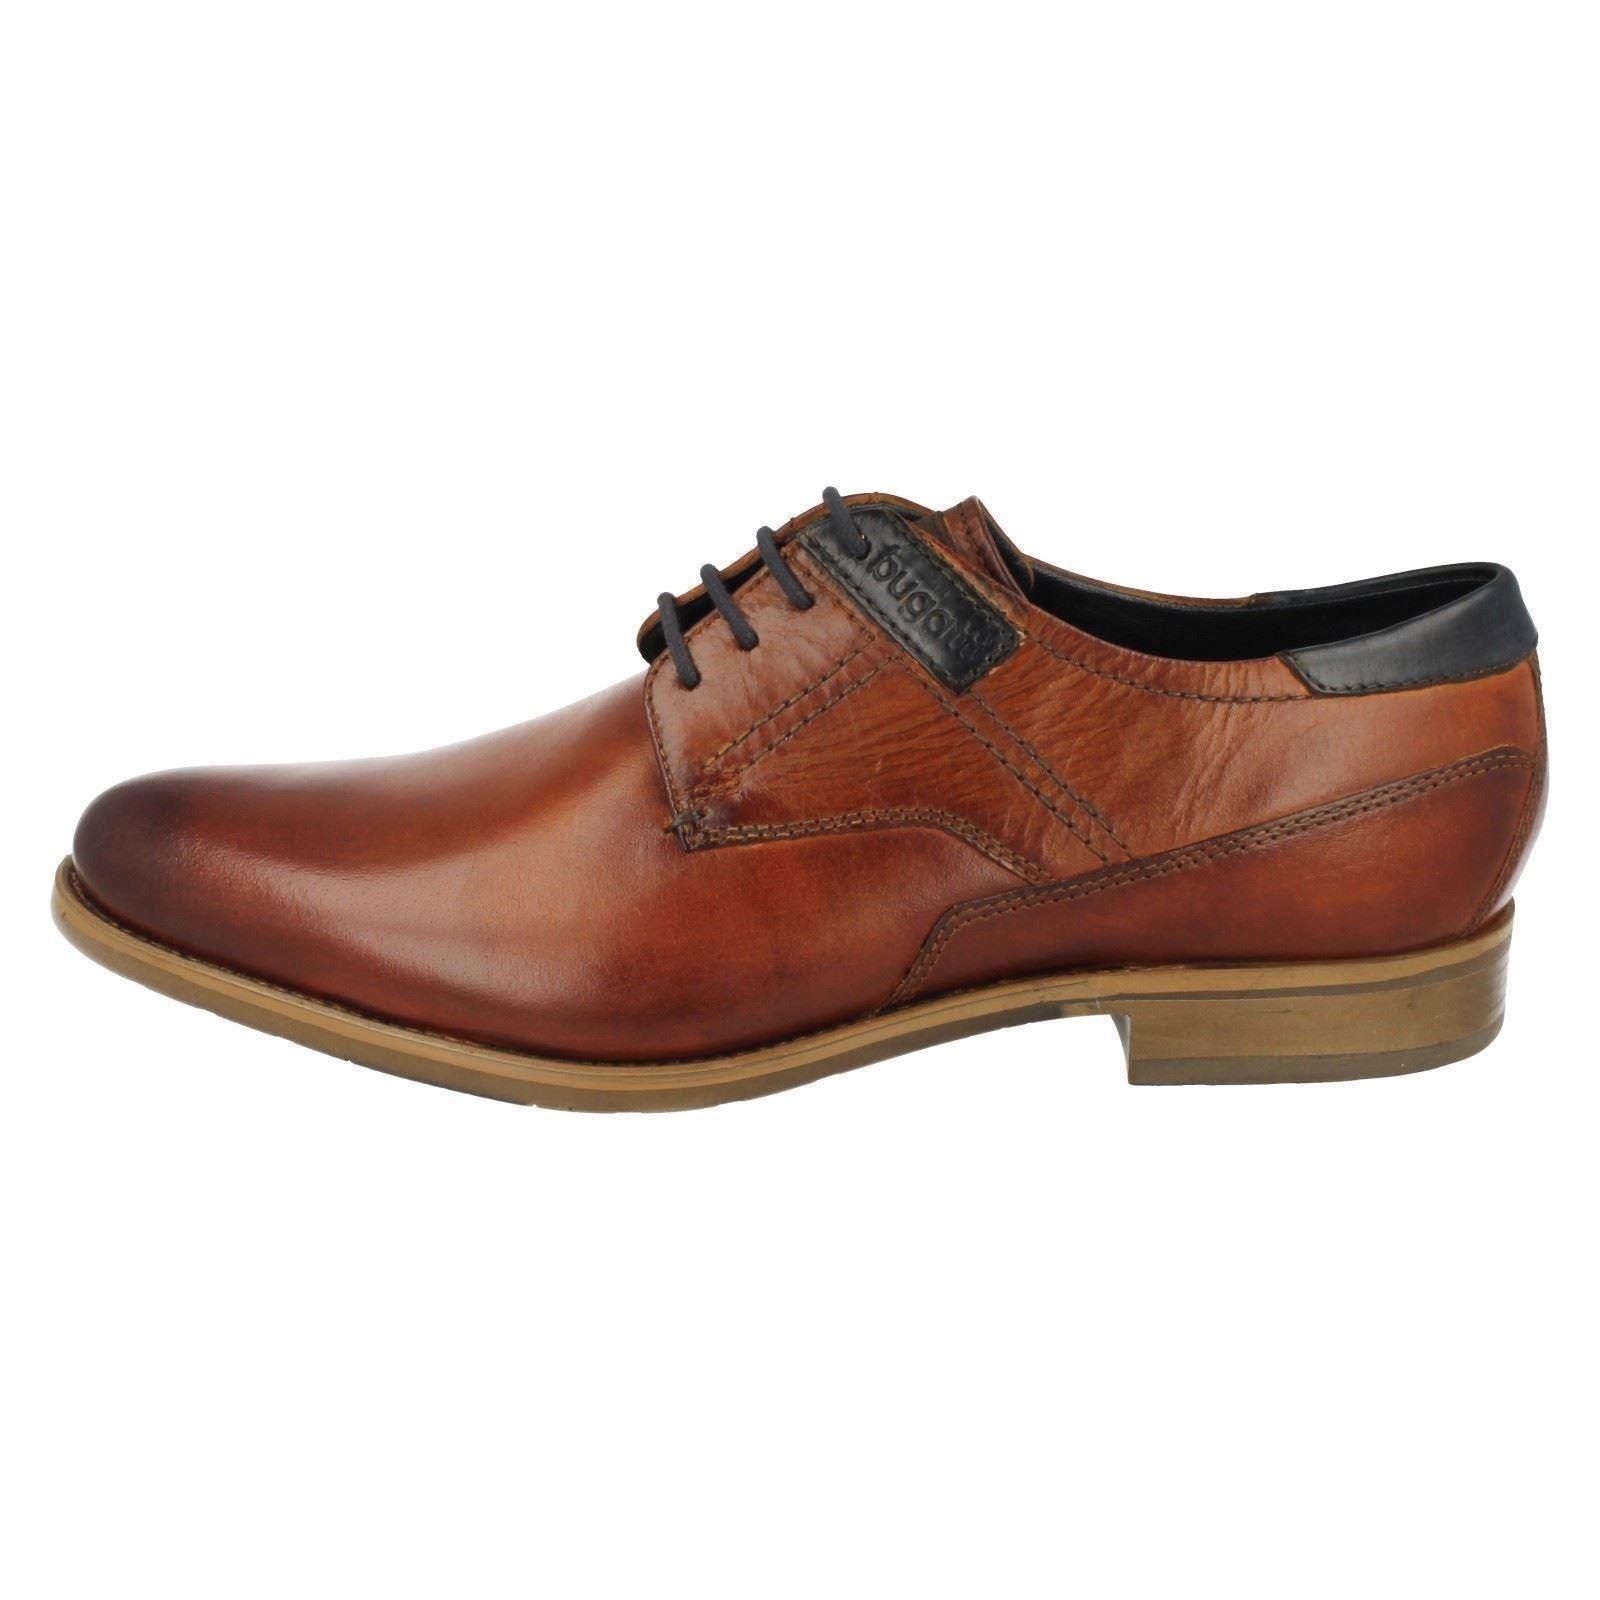 Mens Bugatti Smart Lace Up Shoes 312-16302